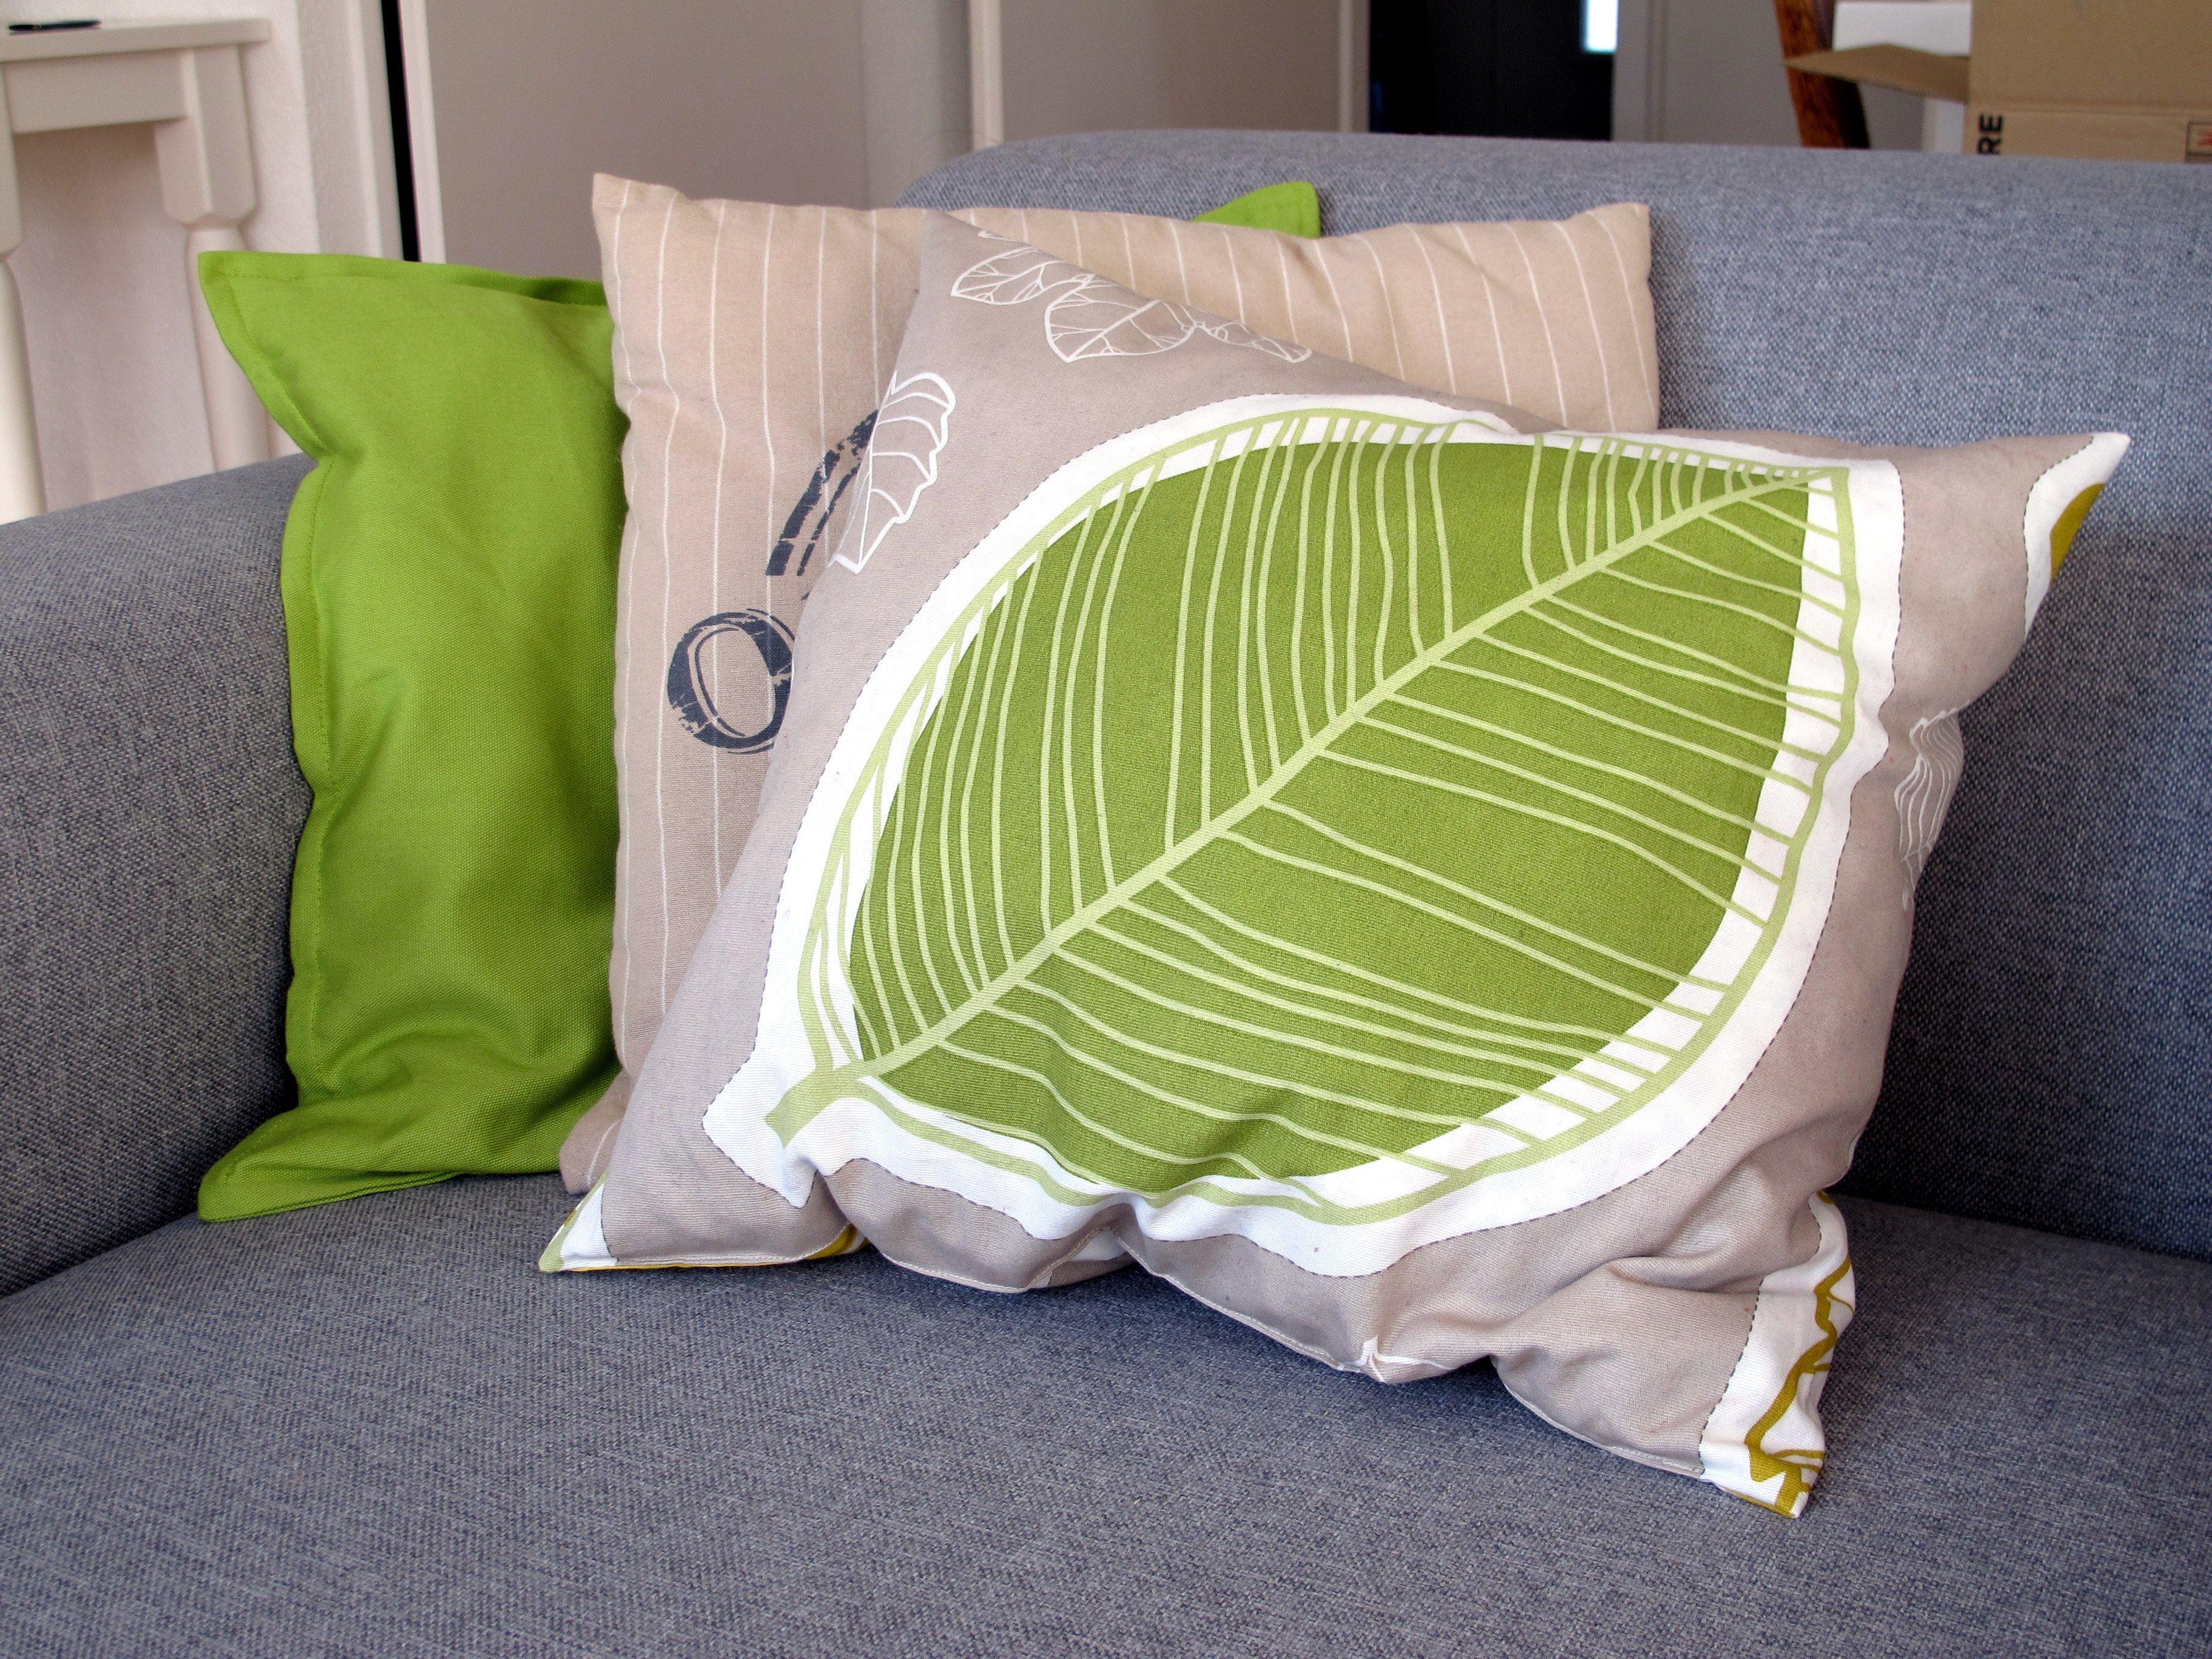 The Pillow Kussen : Stoelkussens inspirerende hs oxford sierkussen taupe cm